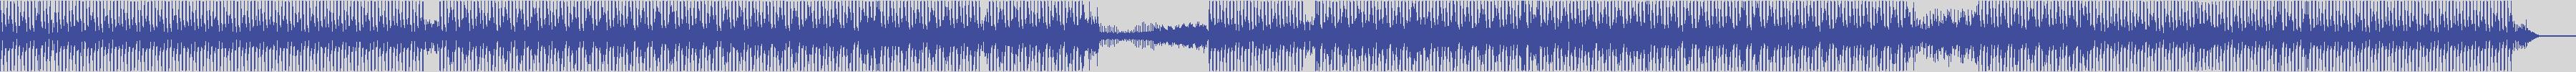 bunny_clan [BYC042] Lorenzo Panico - Free [Original Mix] audio wave form